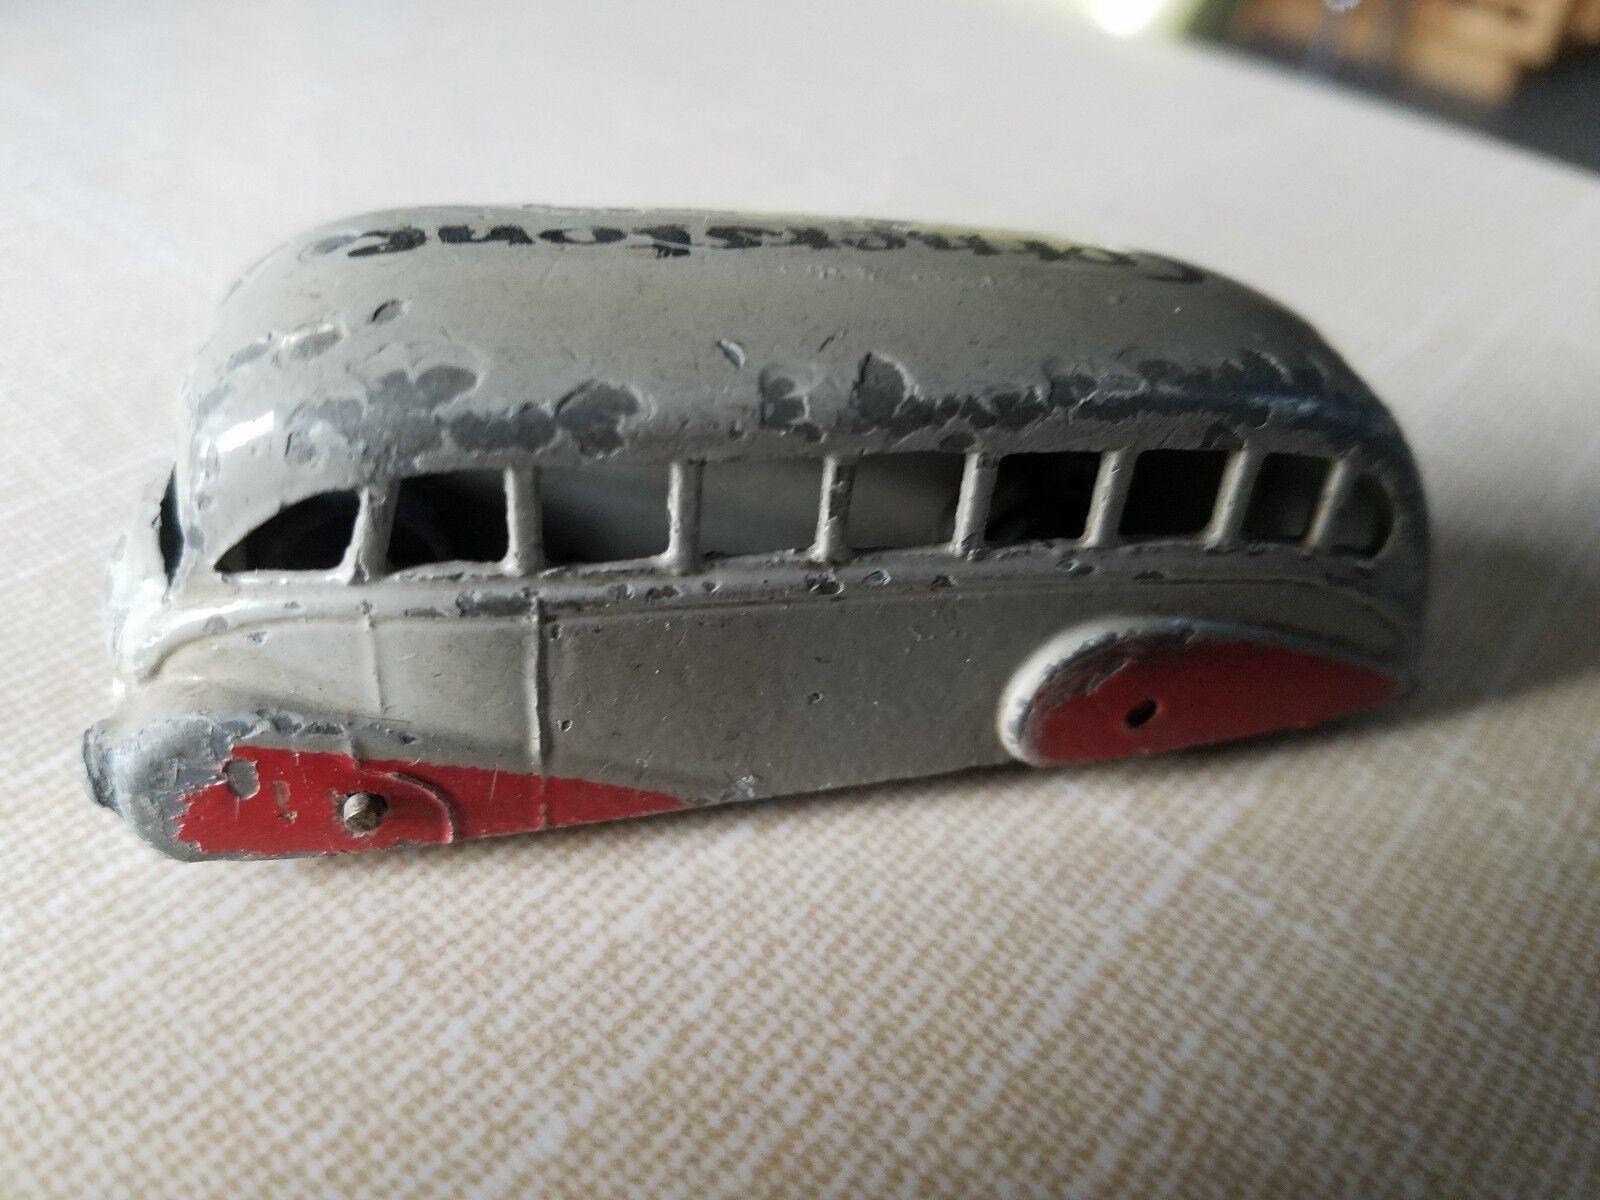 Dinky Toys Bus made in England England England 3e4722